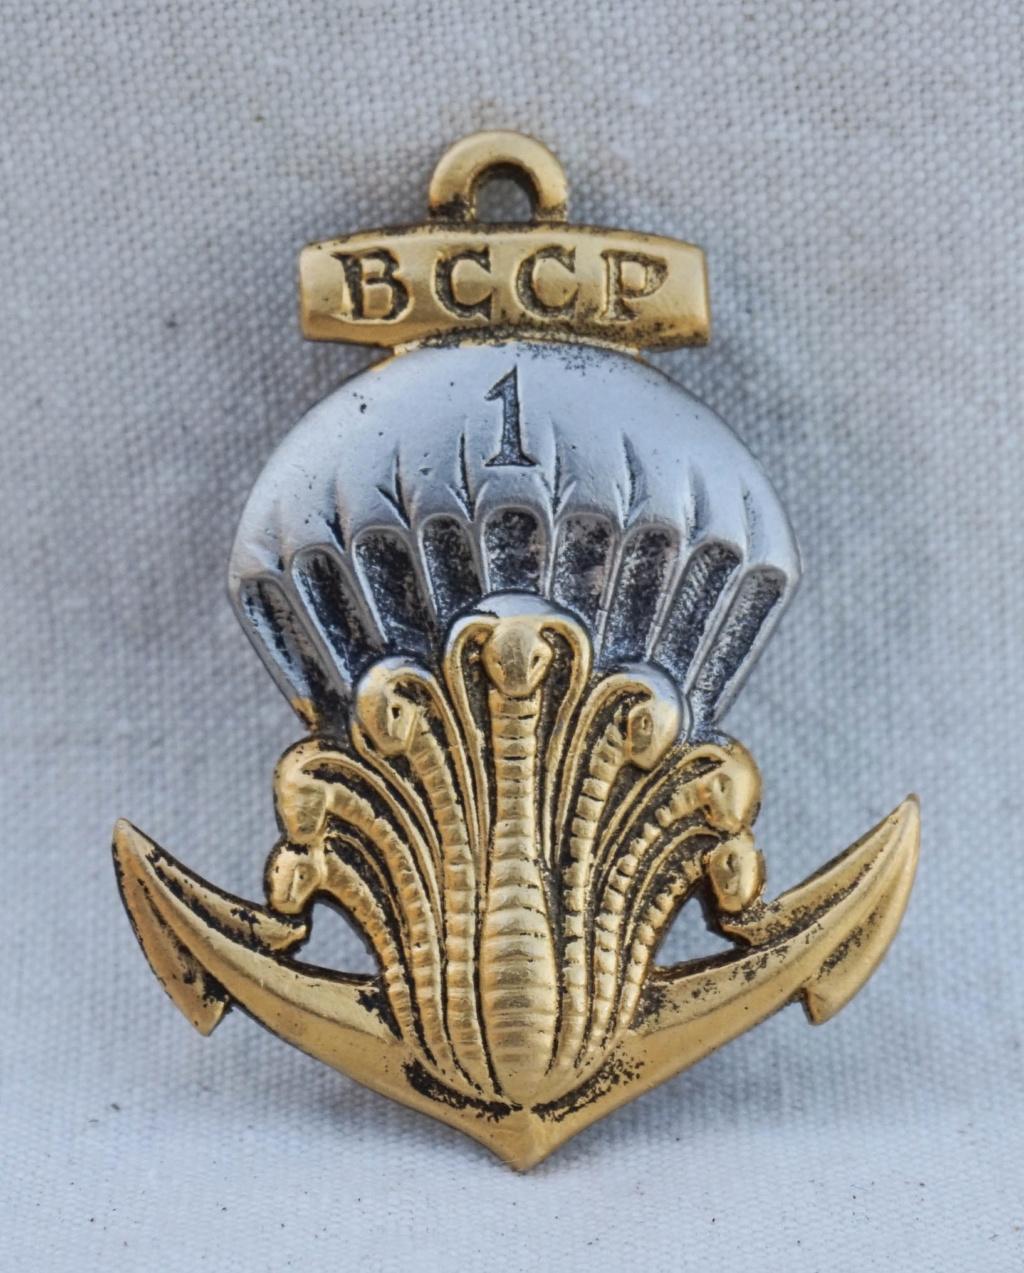 Insigne 6ème BCCP Parachutiste Indochine Drago Paris Nice 25 rue de Beranger - Page 2 1bccp110